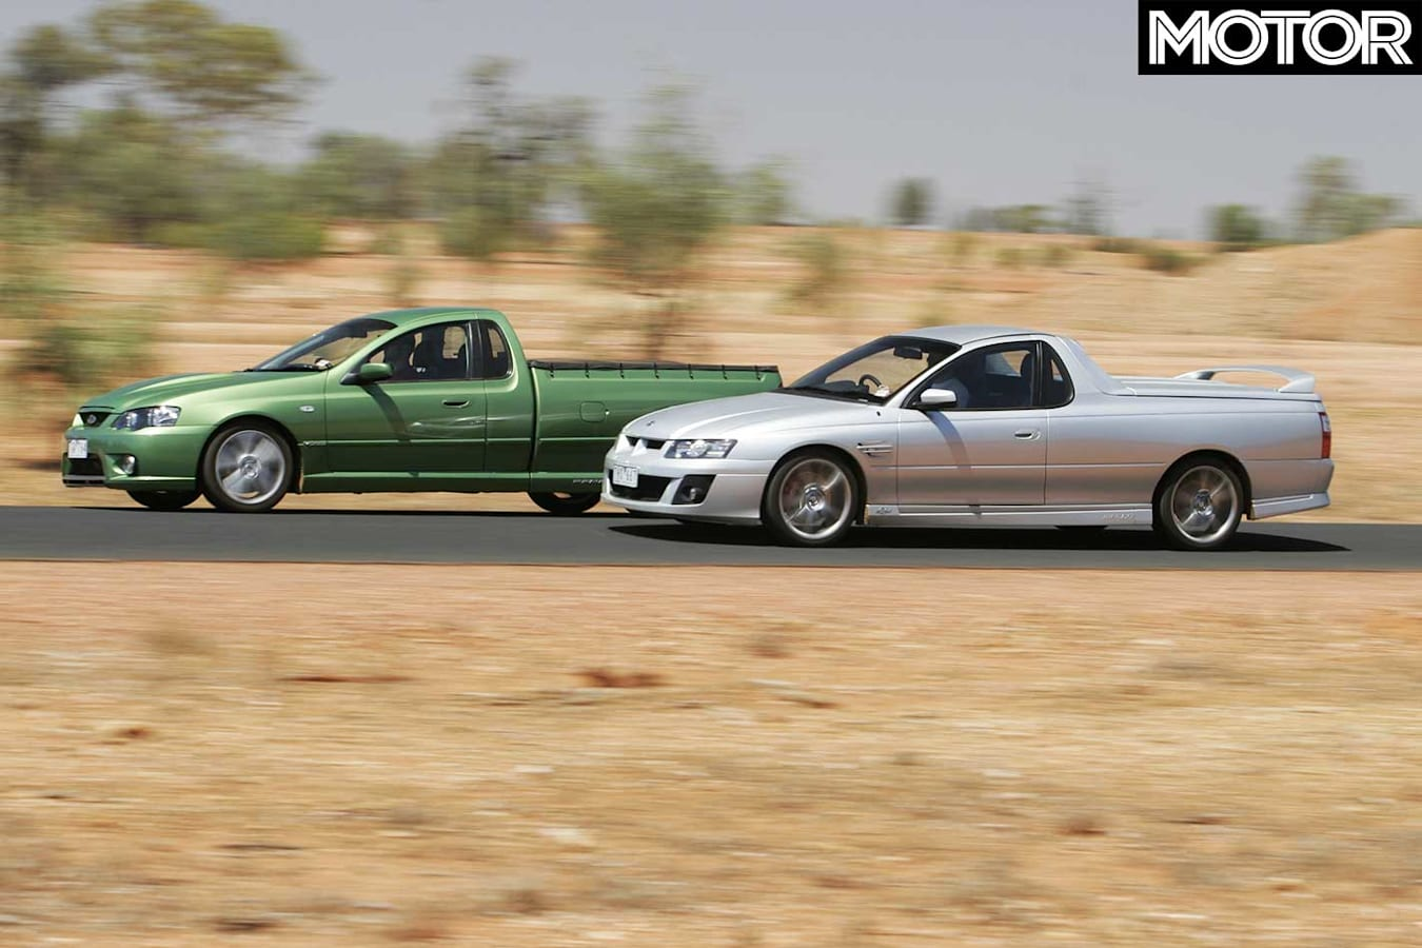 All Aussie Showdown 2005 HSV Maloo R 8 Vs FPV Pursuit Performance Comparison Jpg